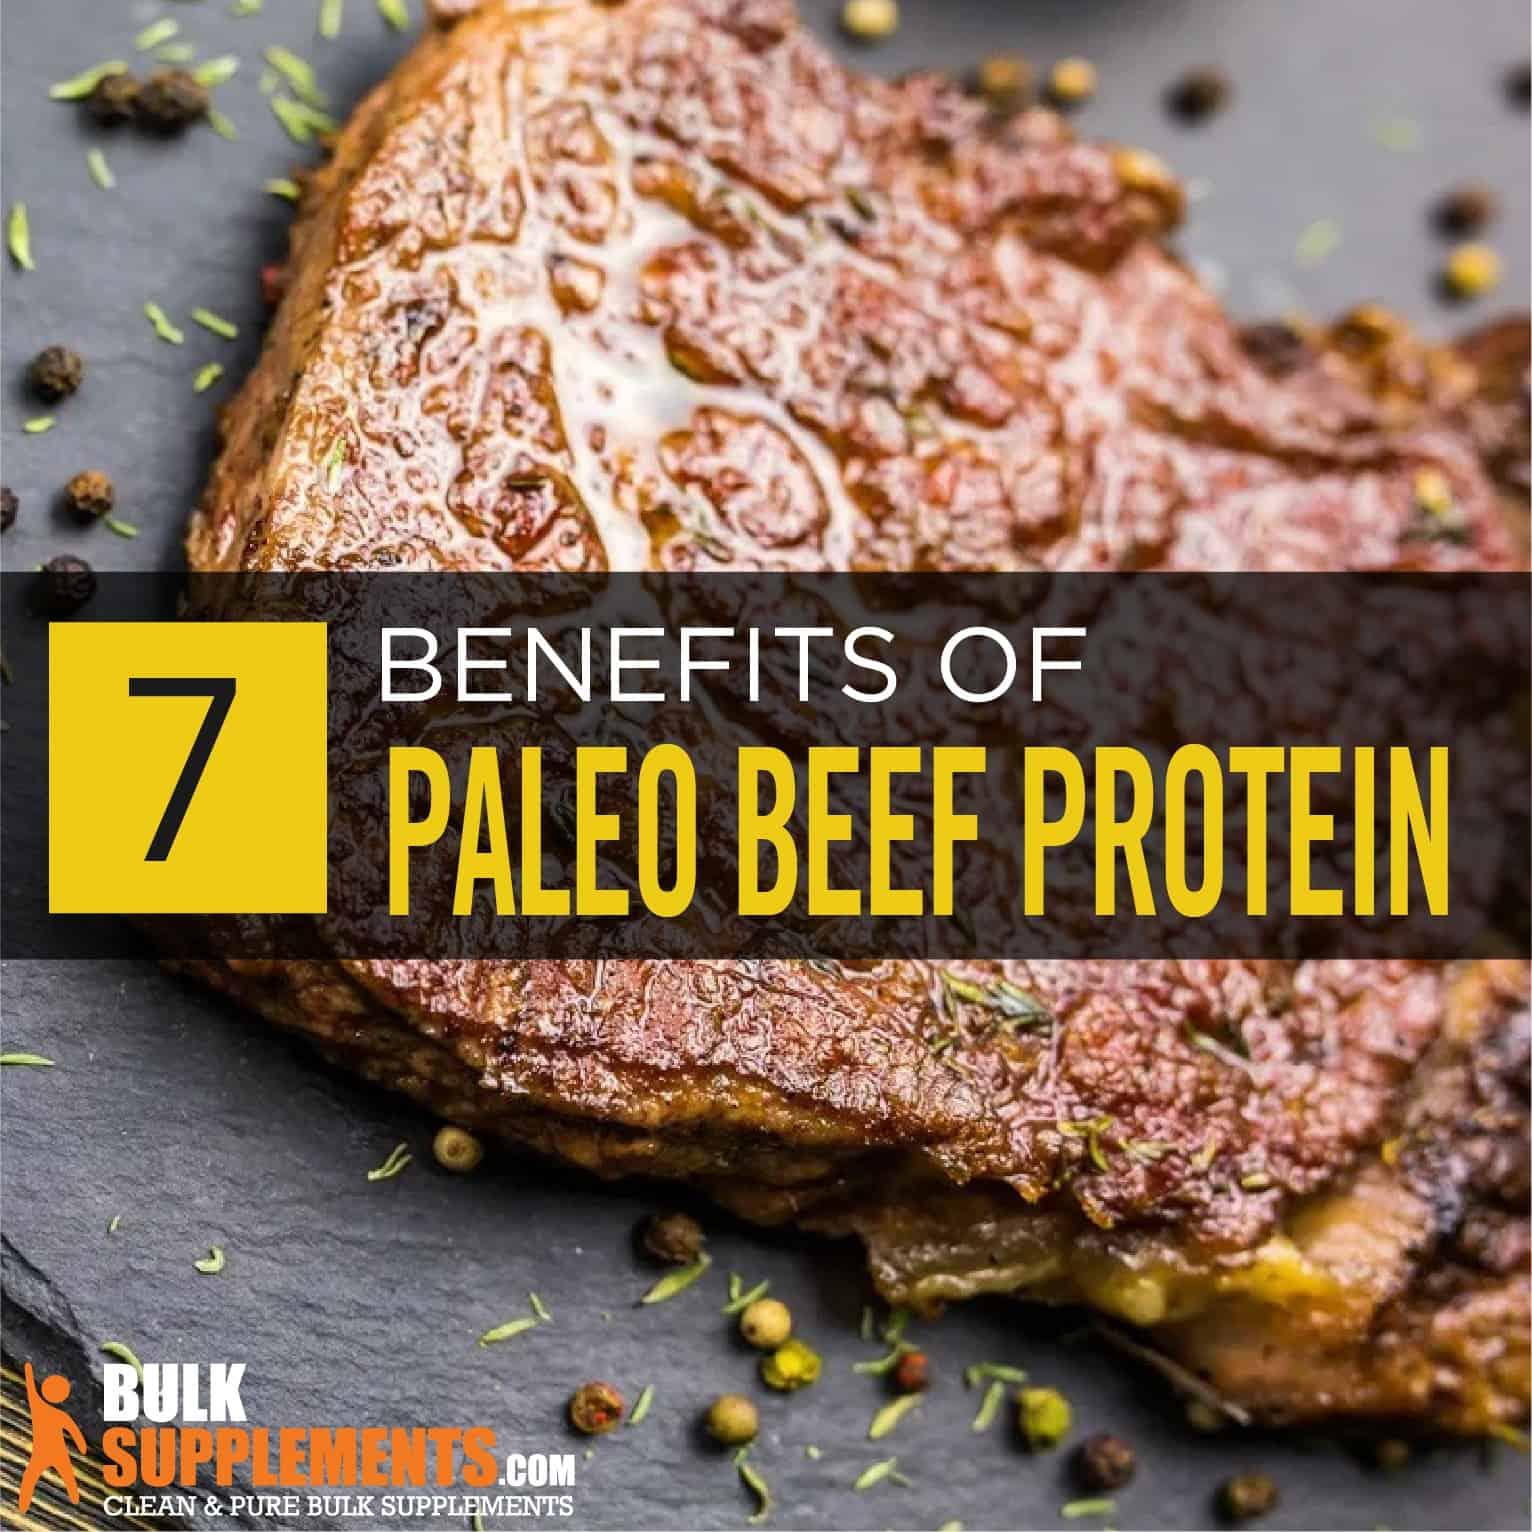 Paleo Beef Protein